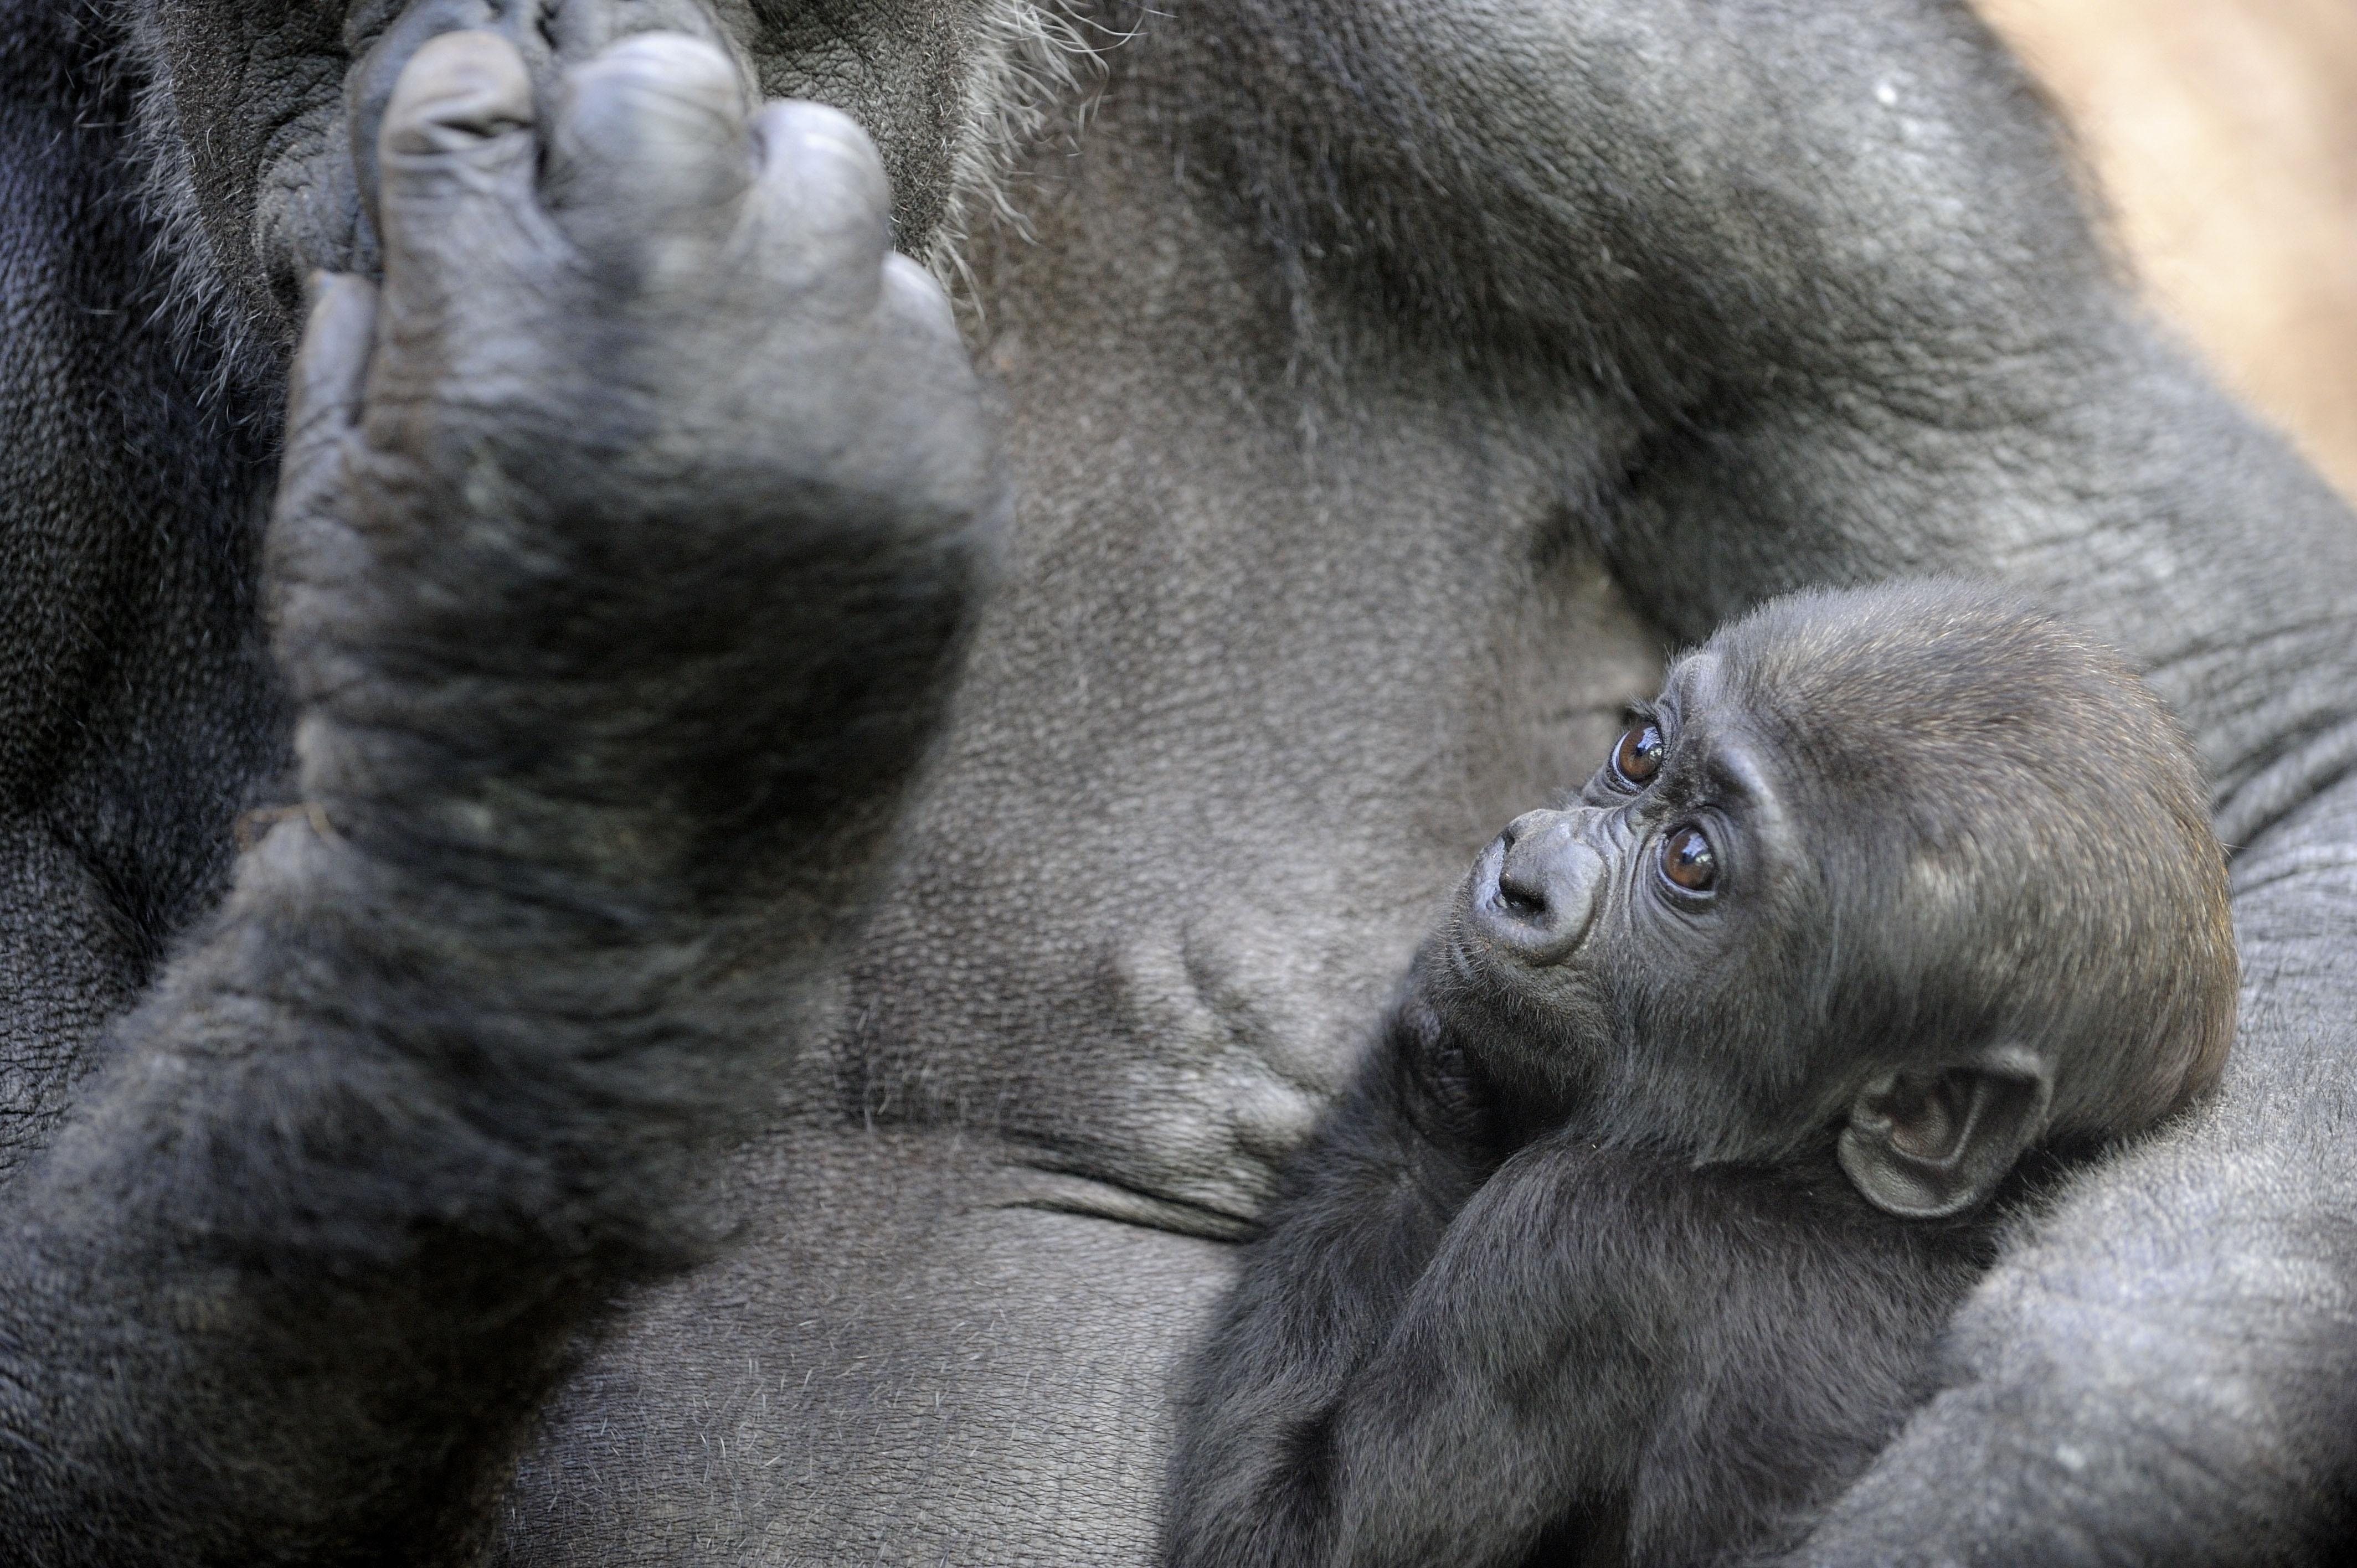 piccol-gorilla.jpg